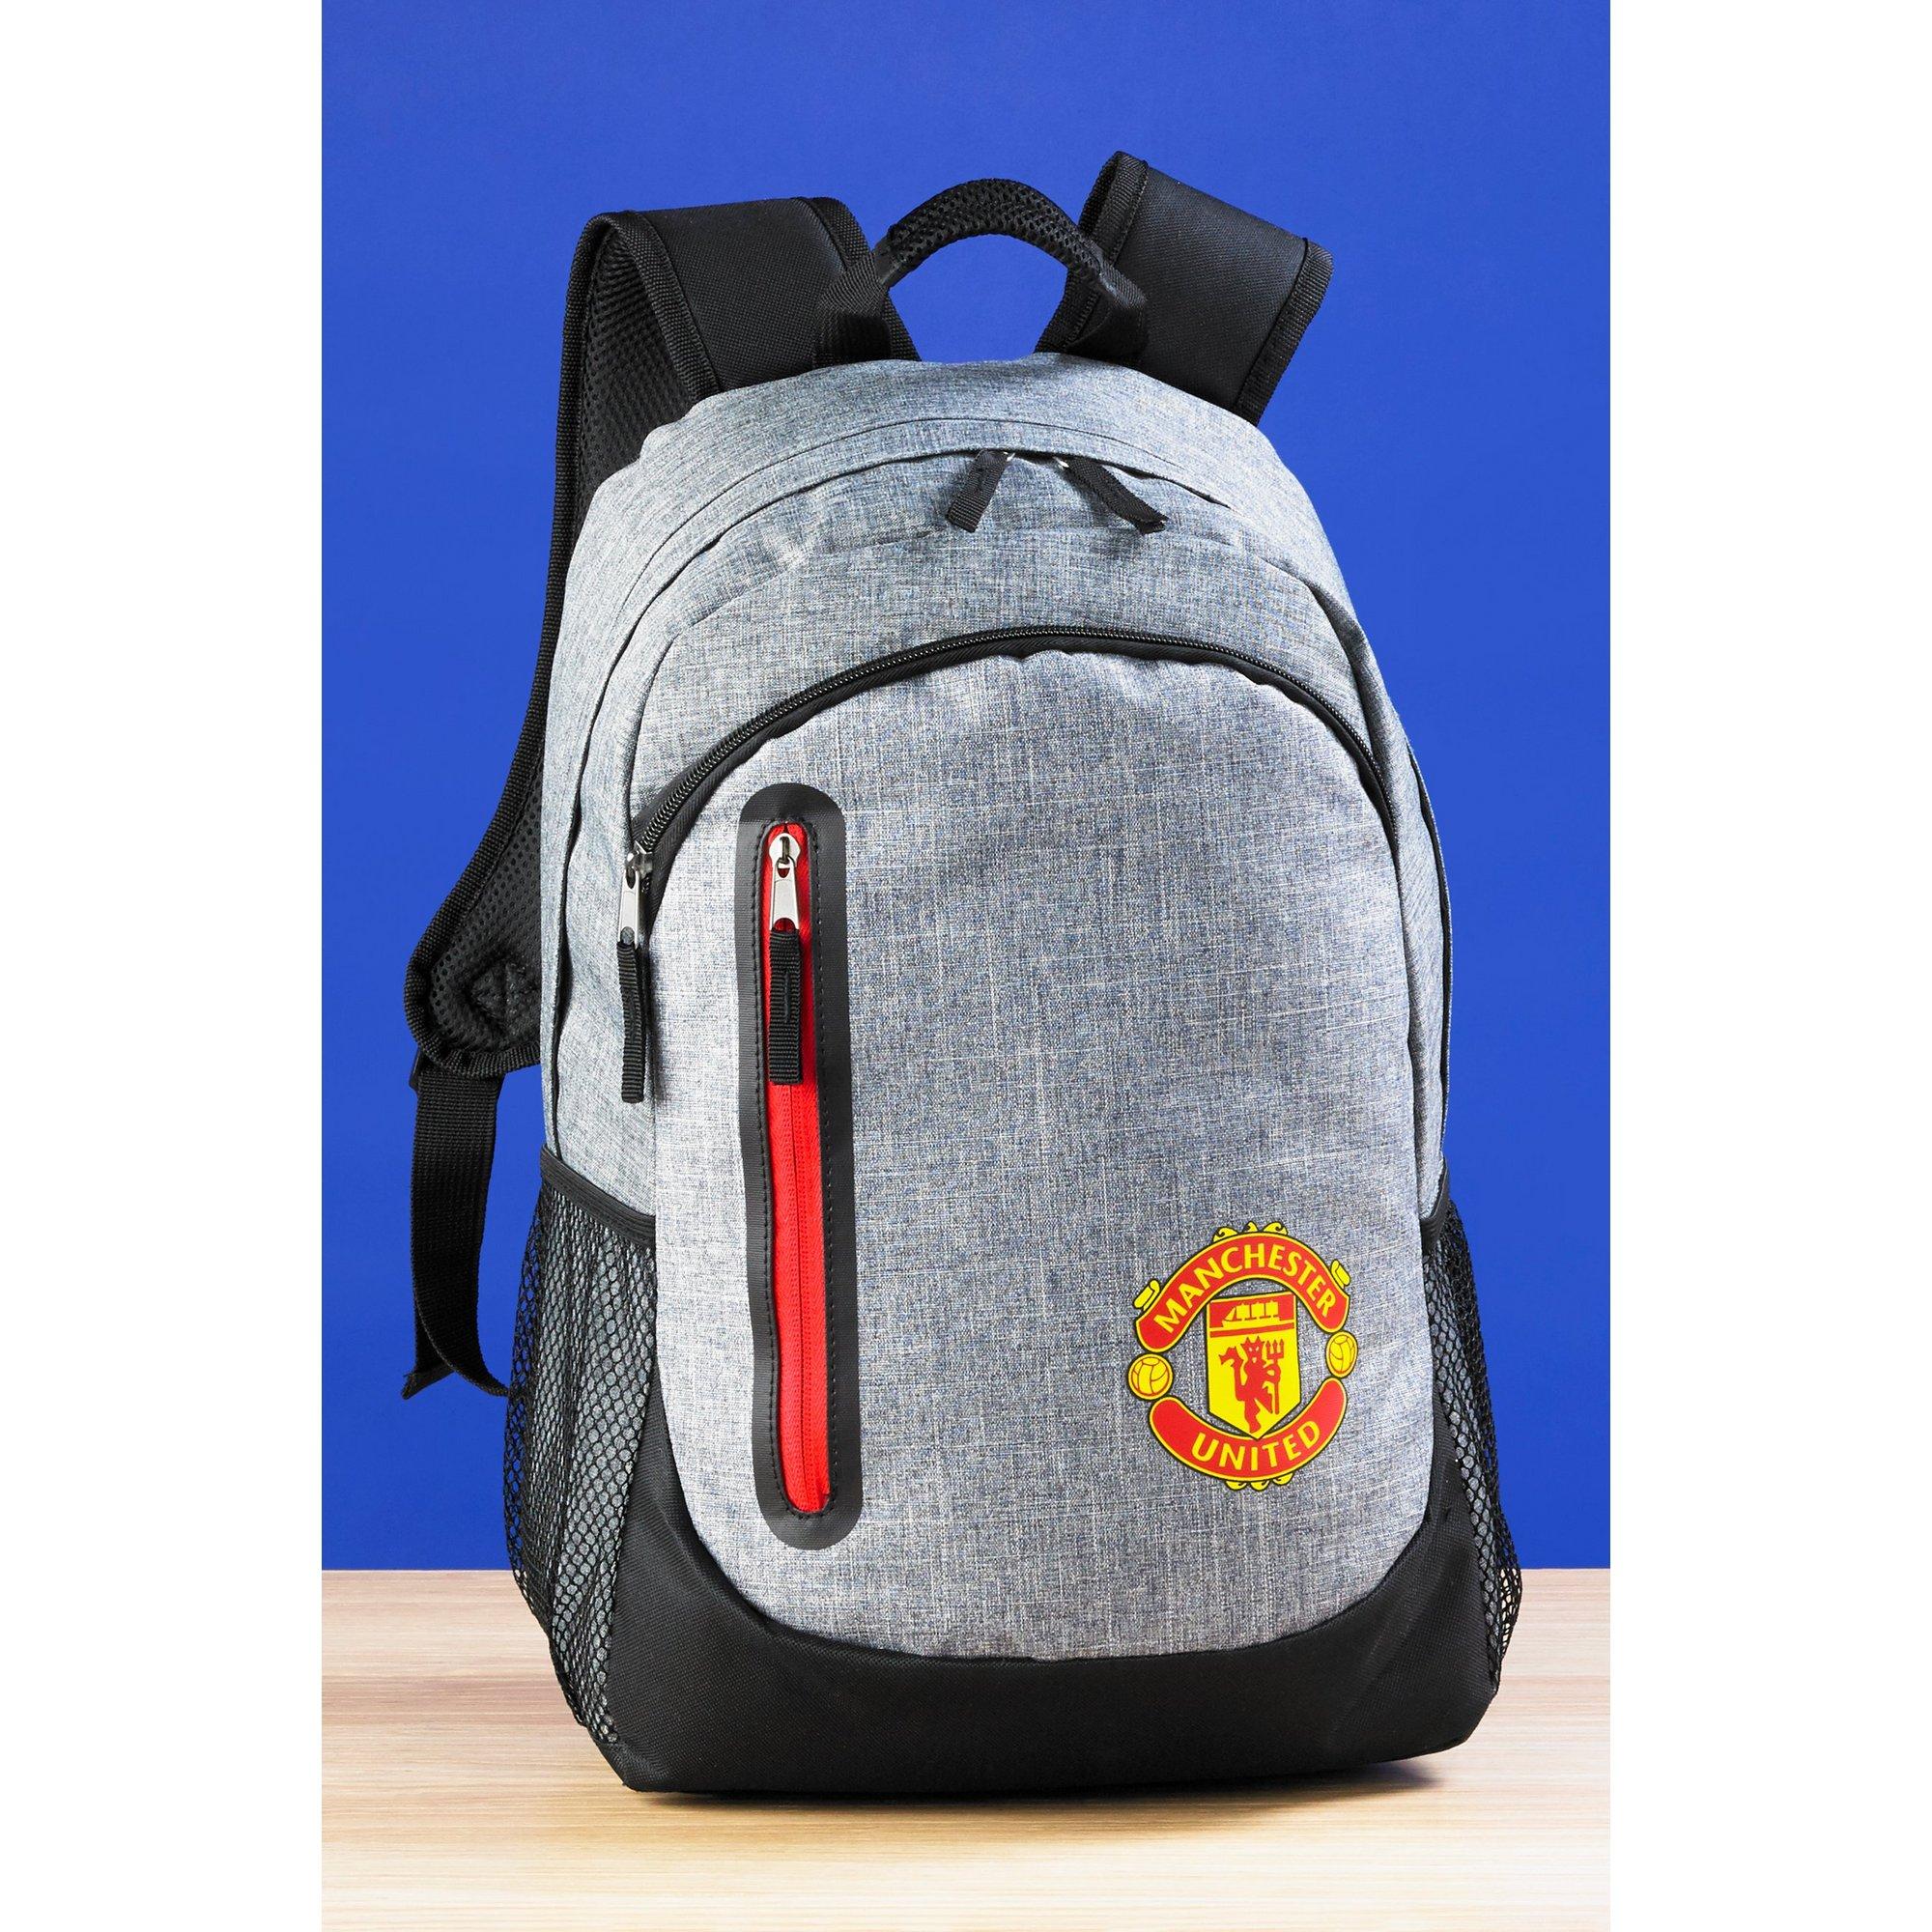 Image of Logo Backpack - Manchester United FC